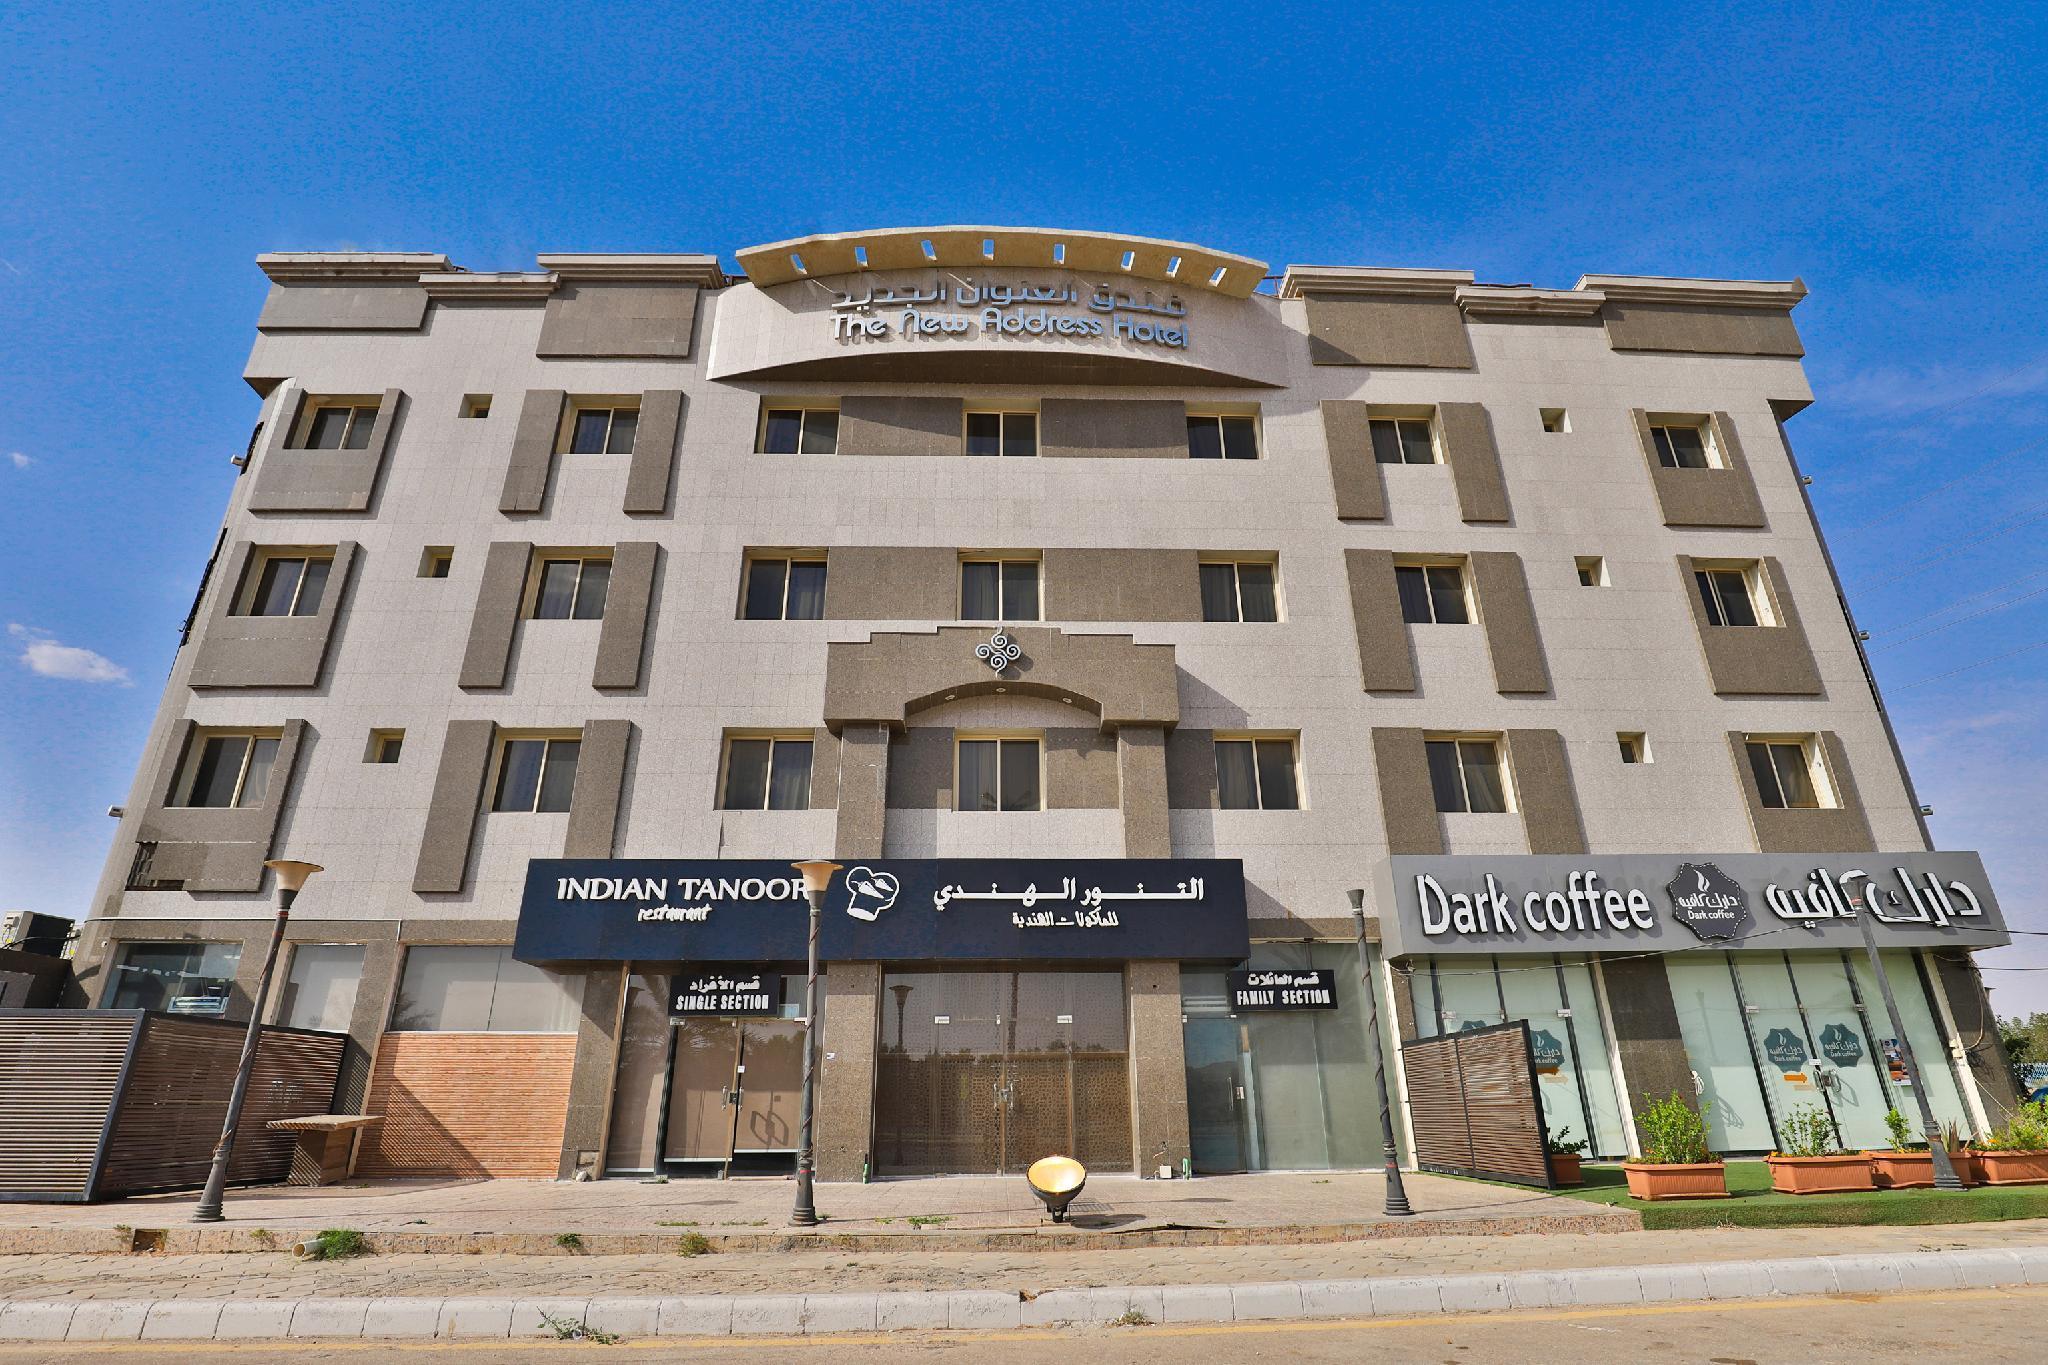 OYO 227 The New Address Hotel